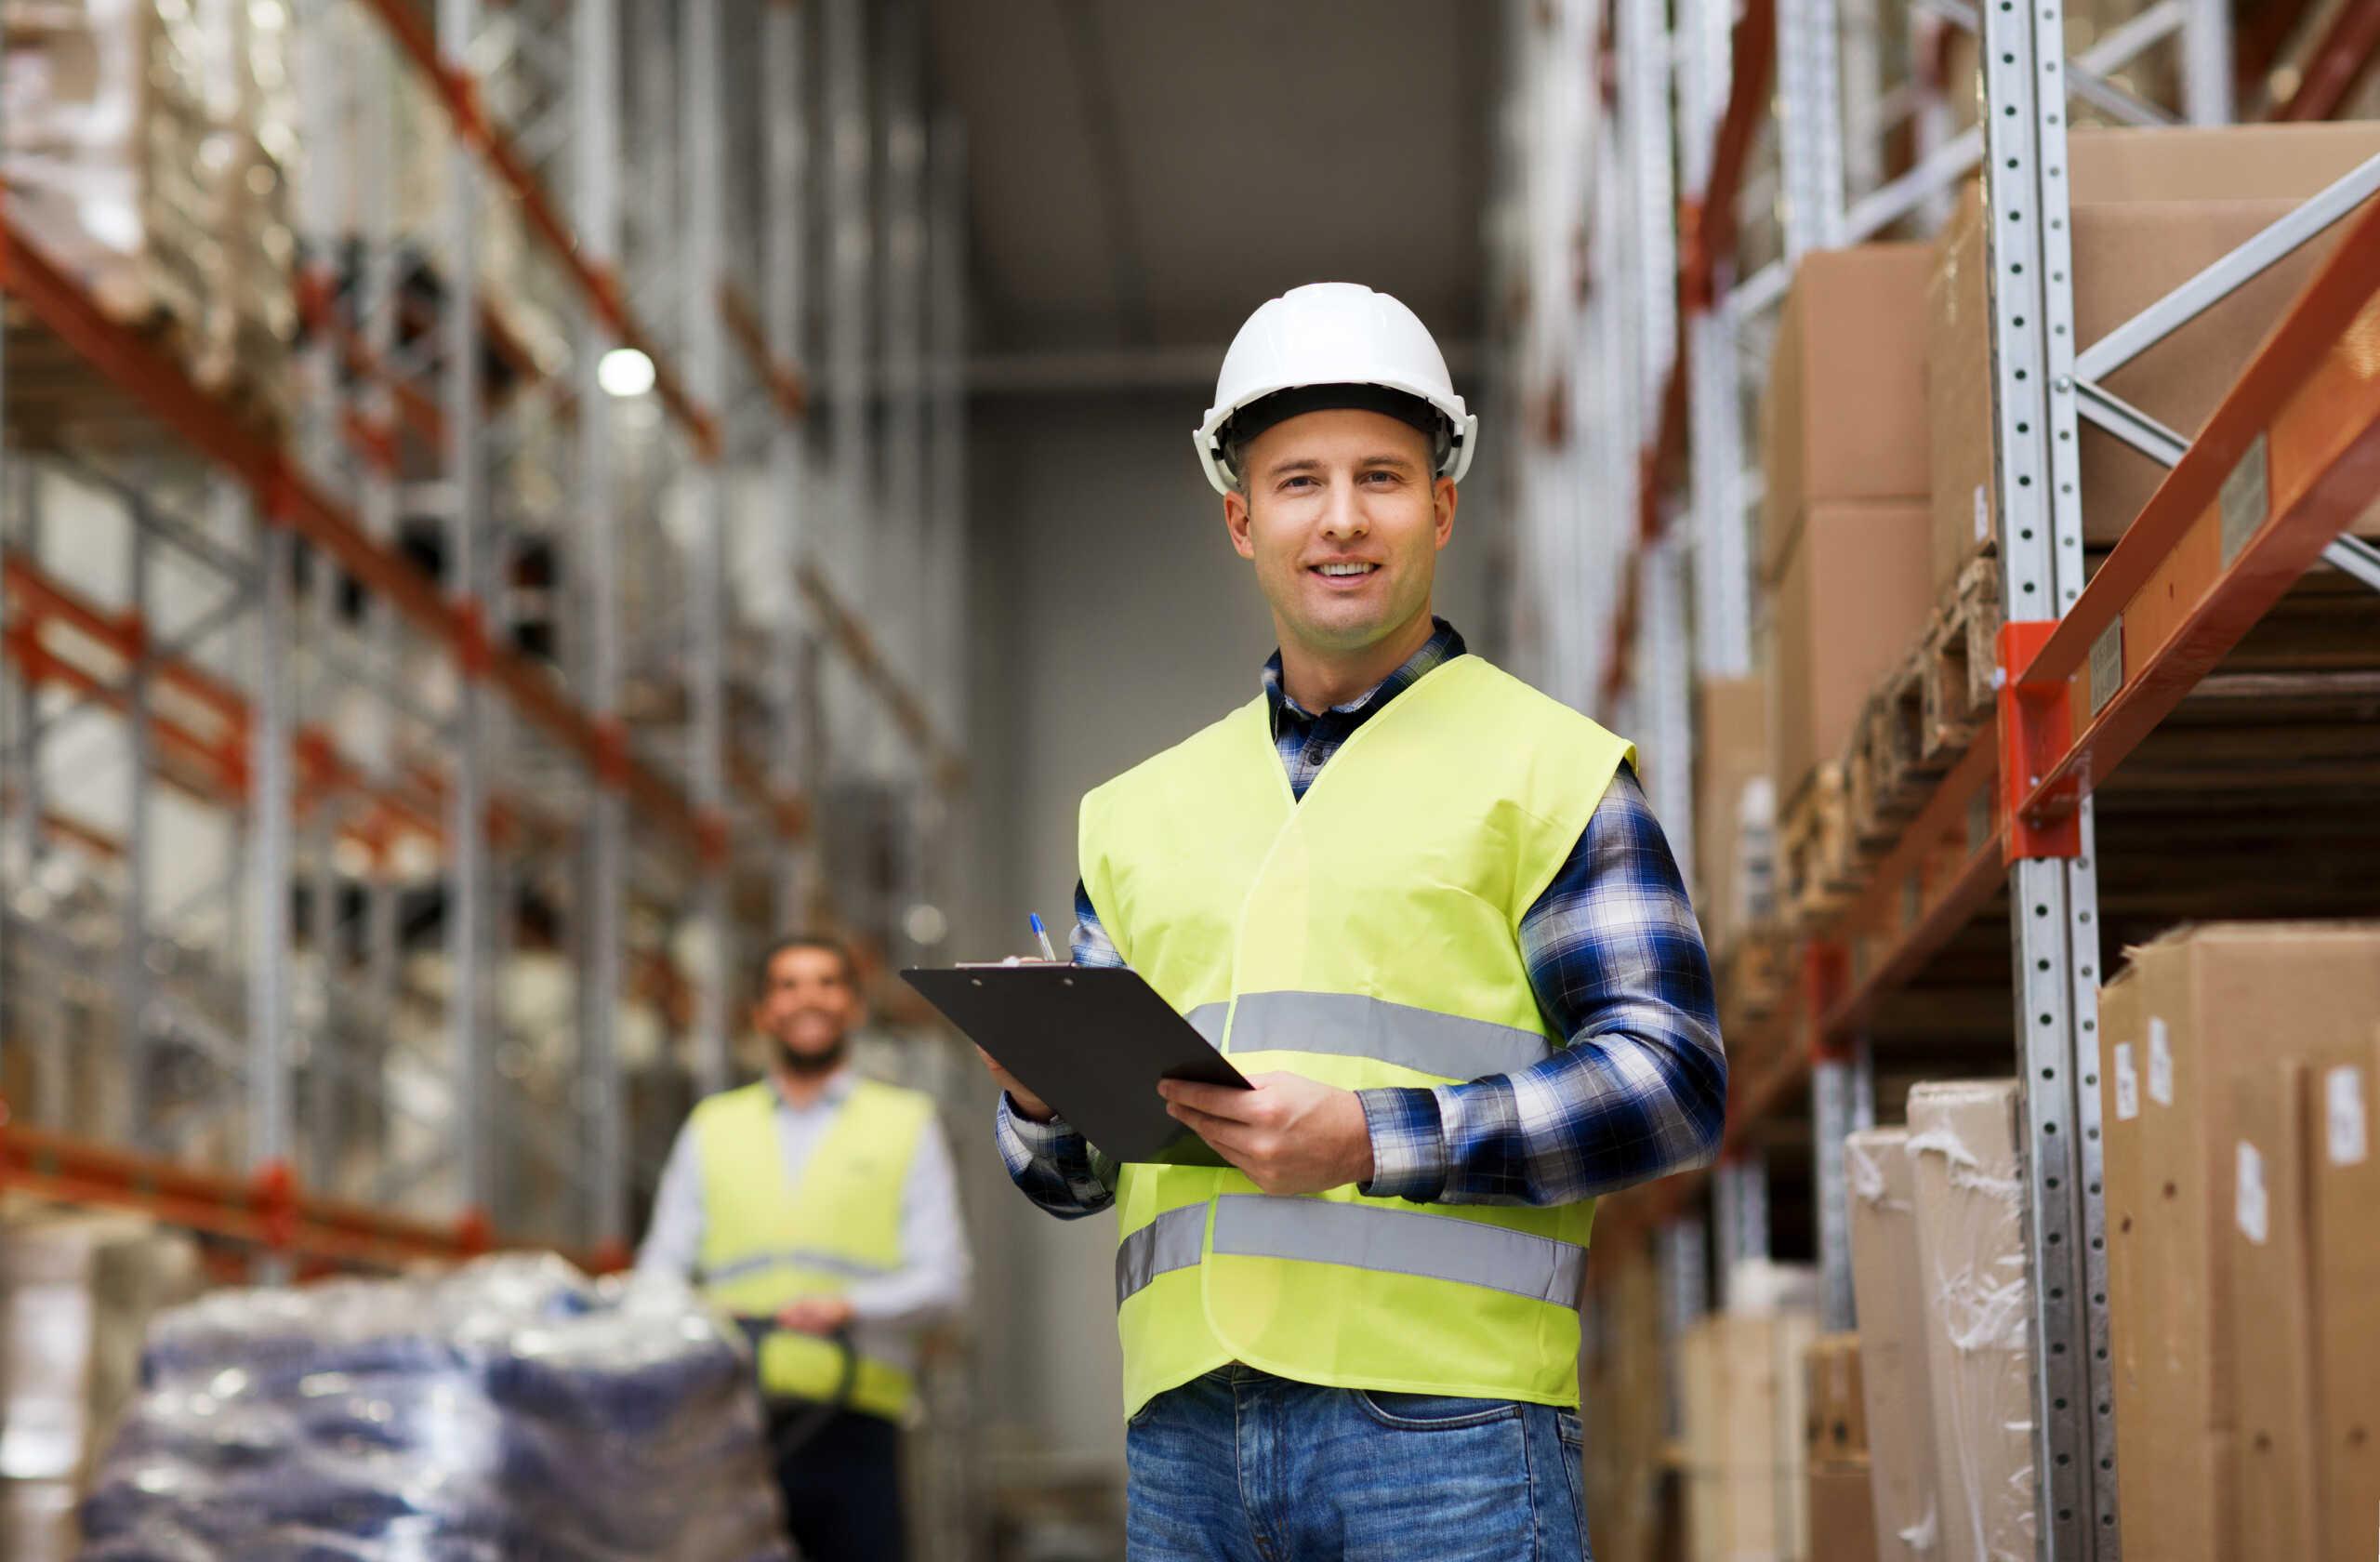 Ohio warehousing & distribution